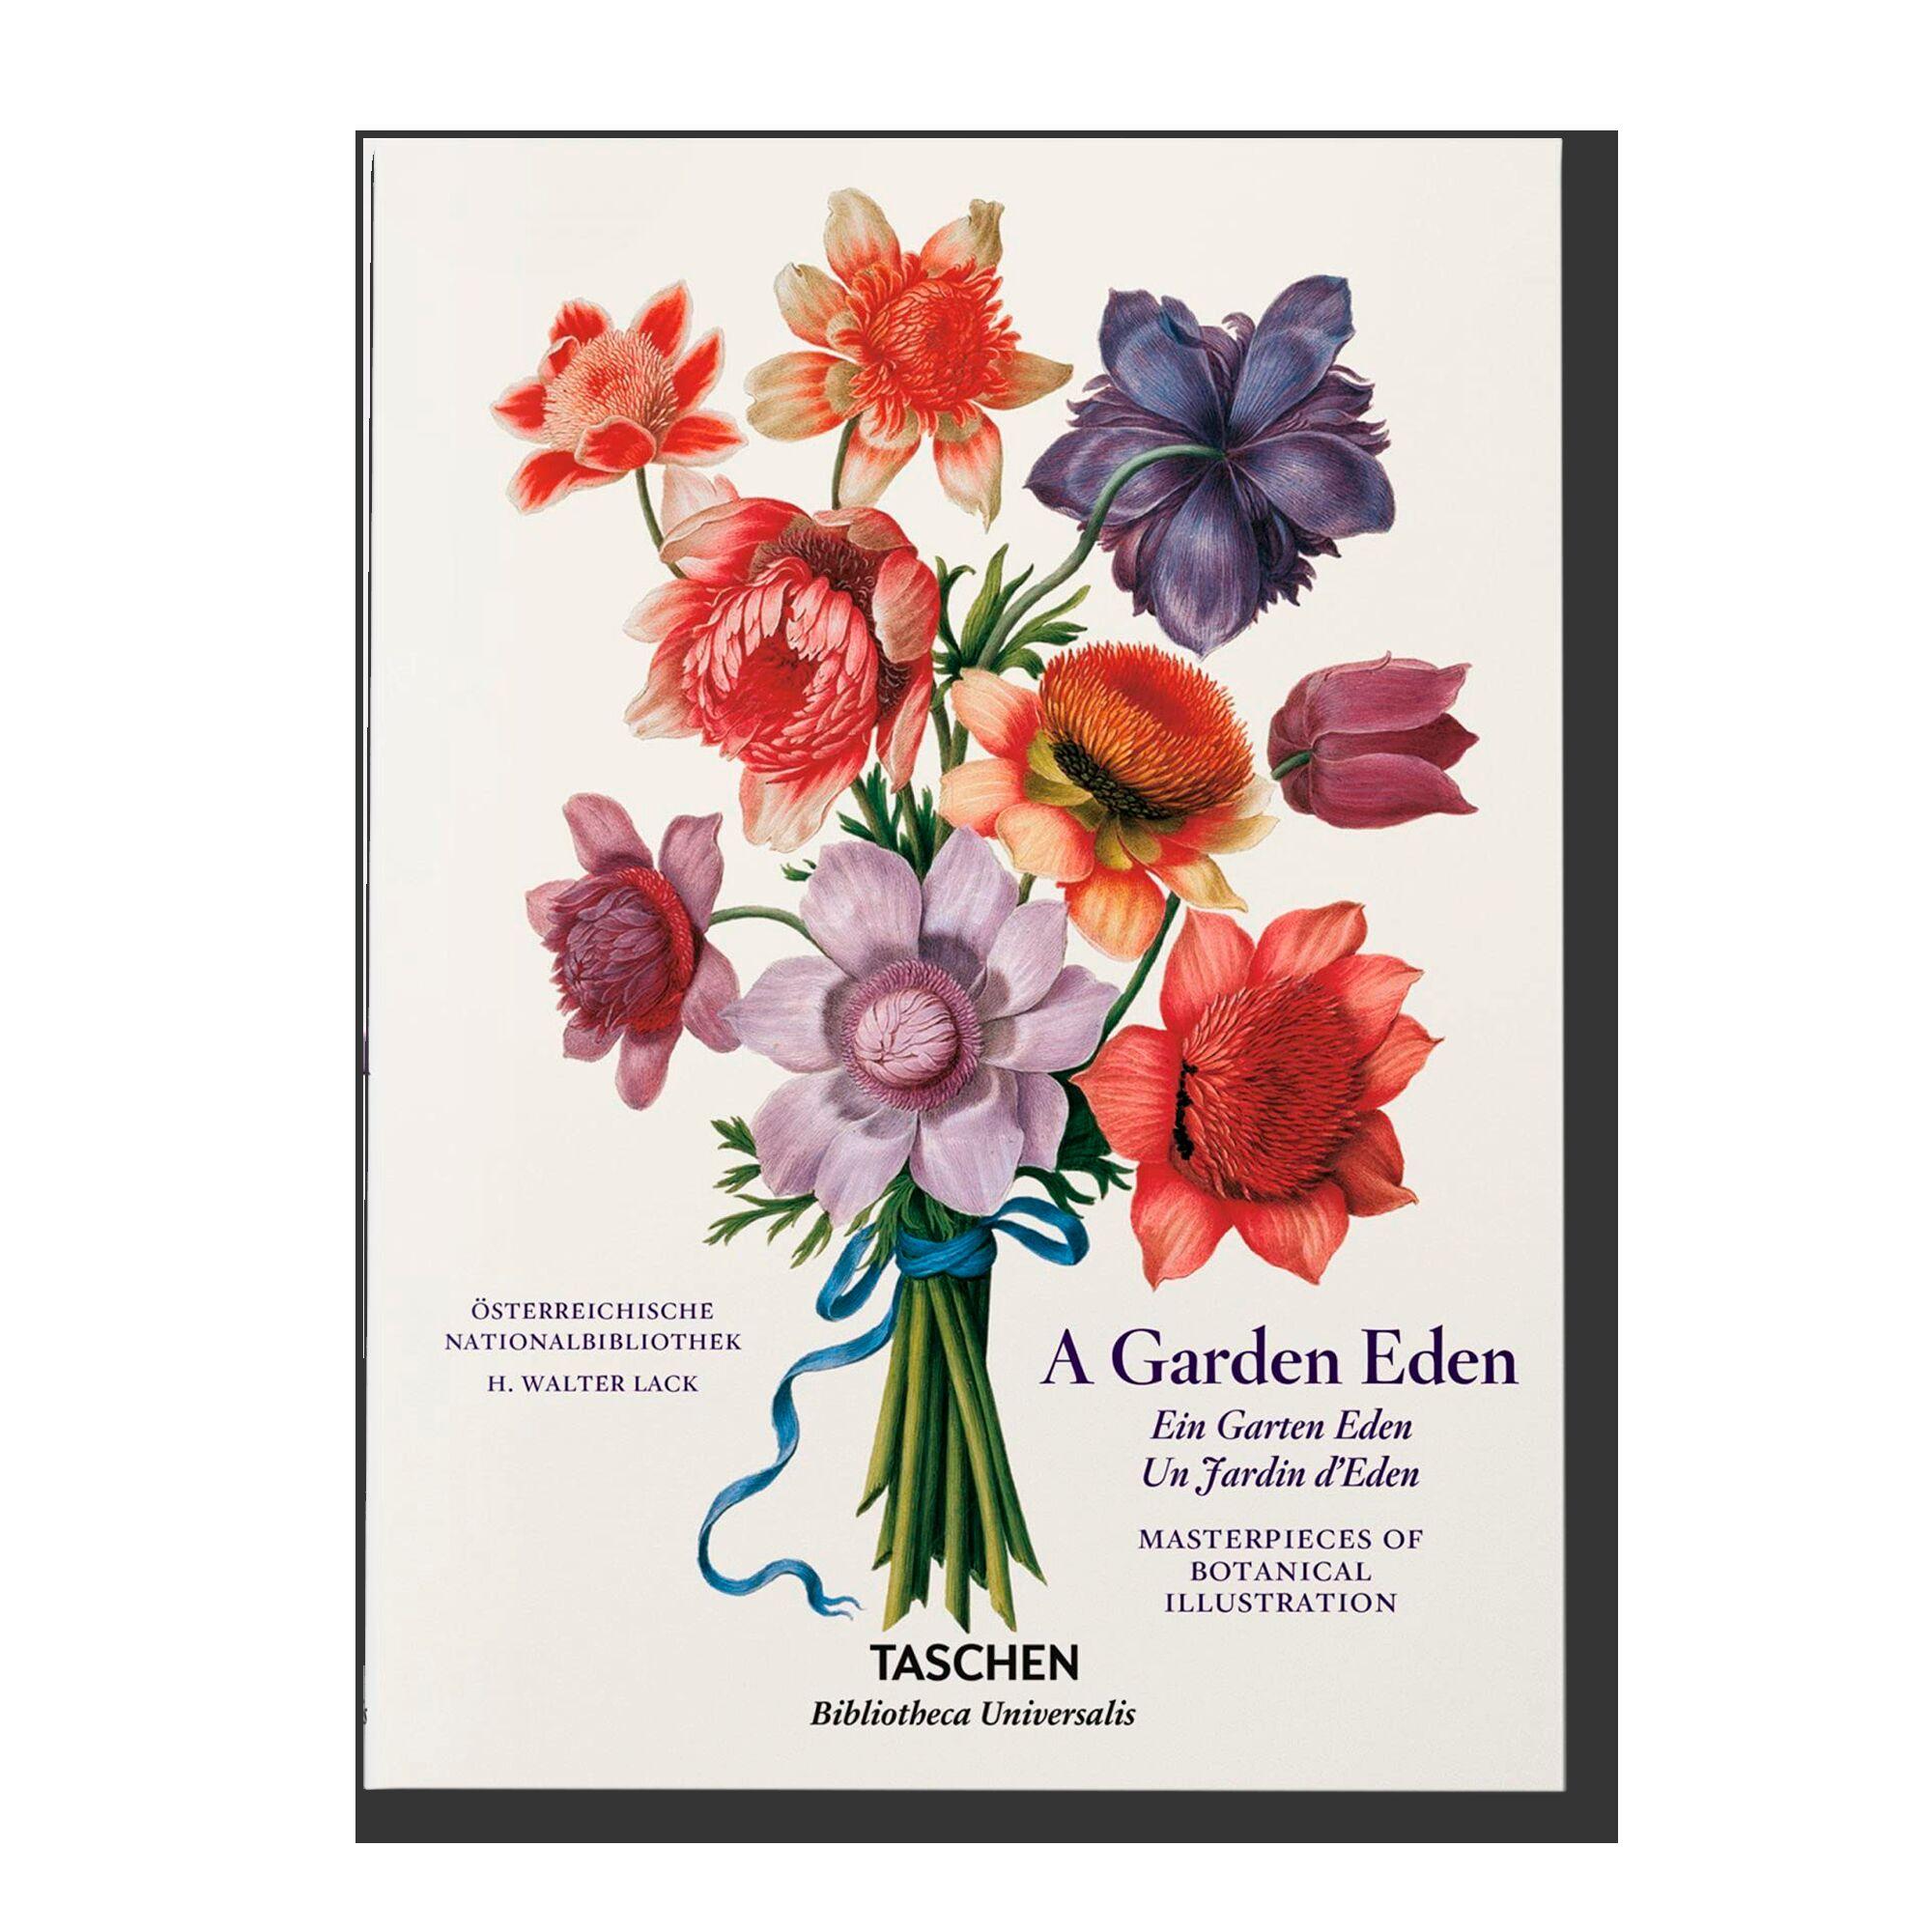 A Garden Eden: Masterpieces of Botanical Illustration (Bibliotheca Universalis)